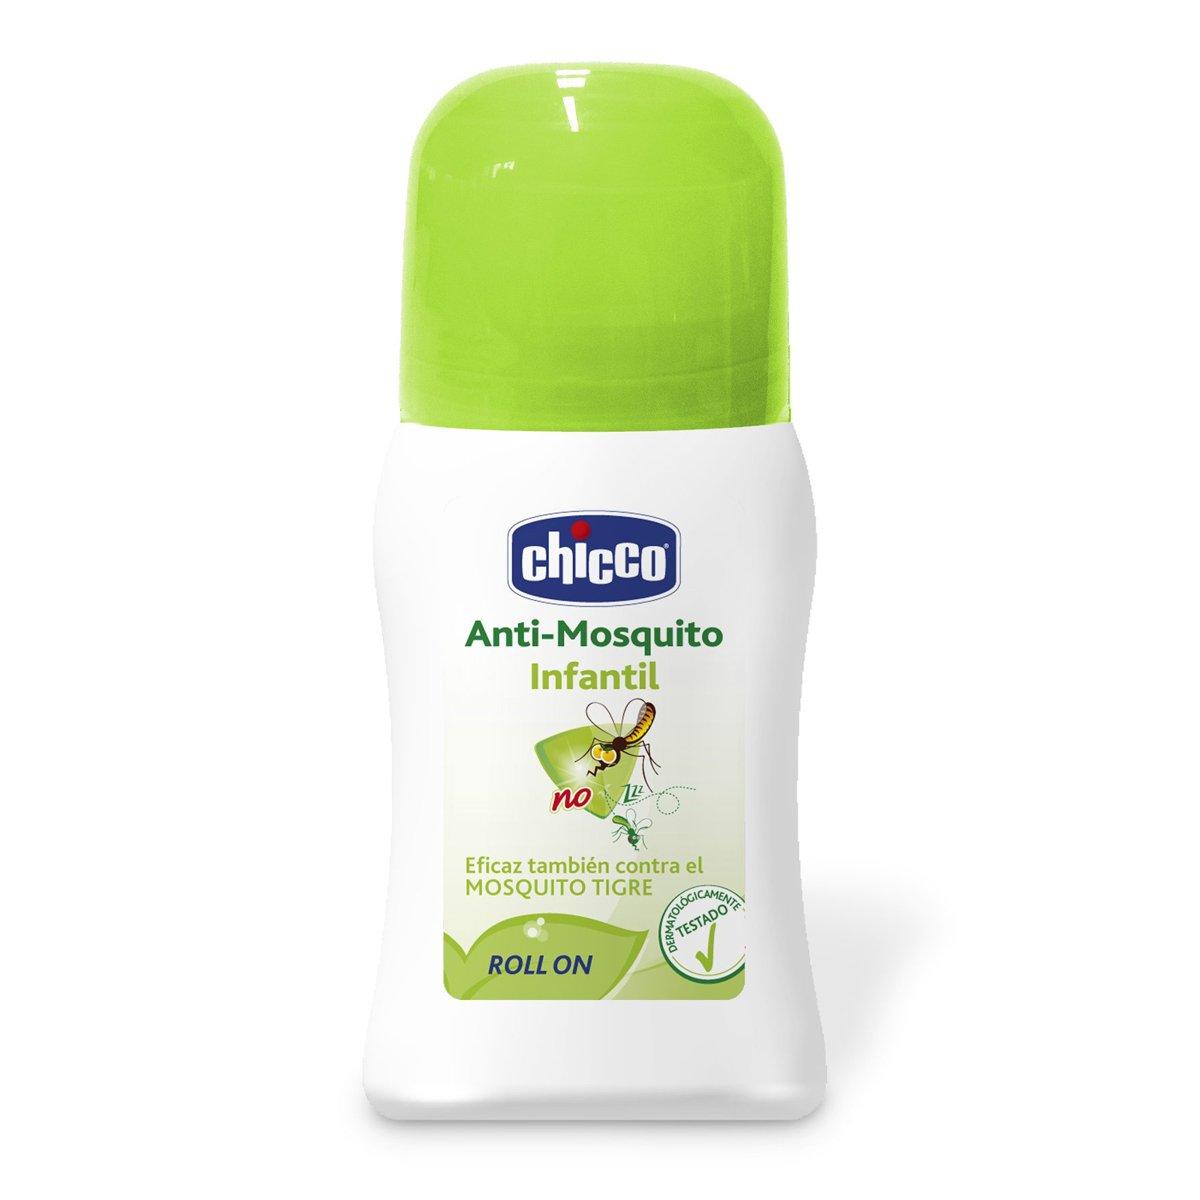 Chicco - Roll on antimosquitos protección 3 horas